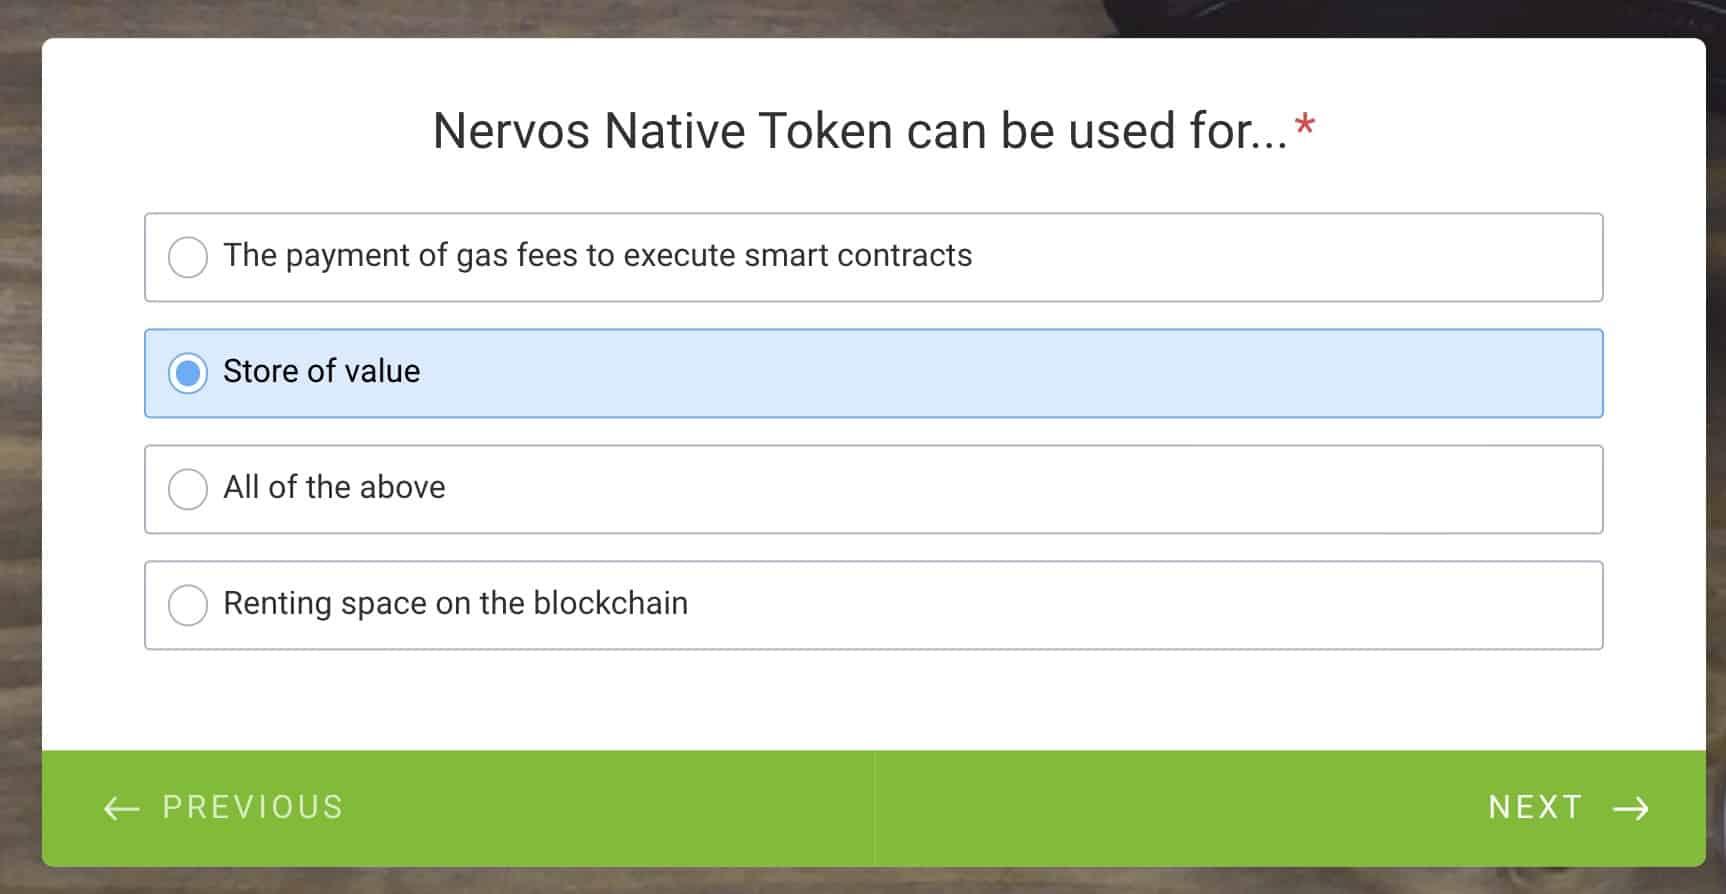 nervos store of value